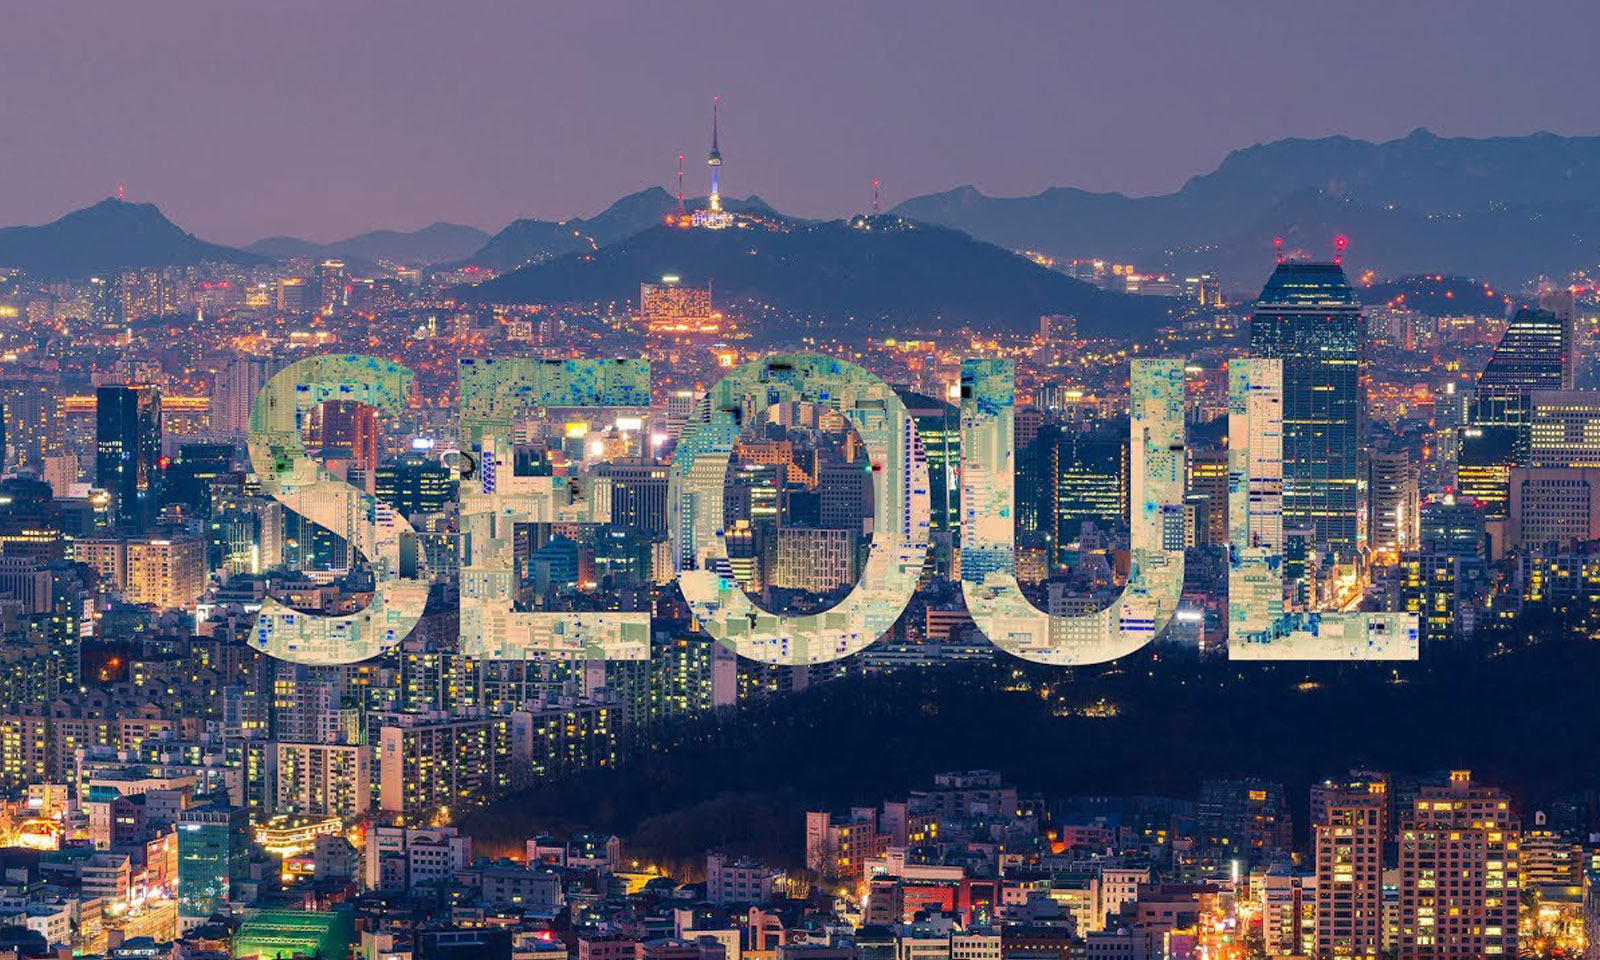 TOUR TẾT: JEJU – SEOUL – ĐẢO NAMI - TRƯỢT TUYẾT ELISIAN KANGCHON SKI – JEJU 6N5Đ